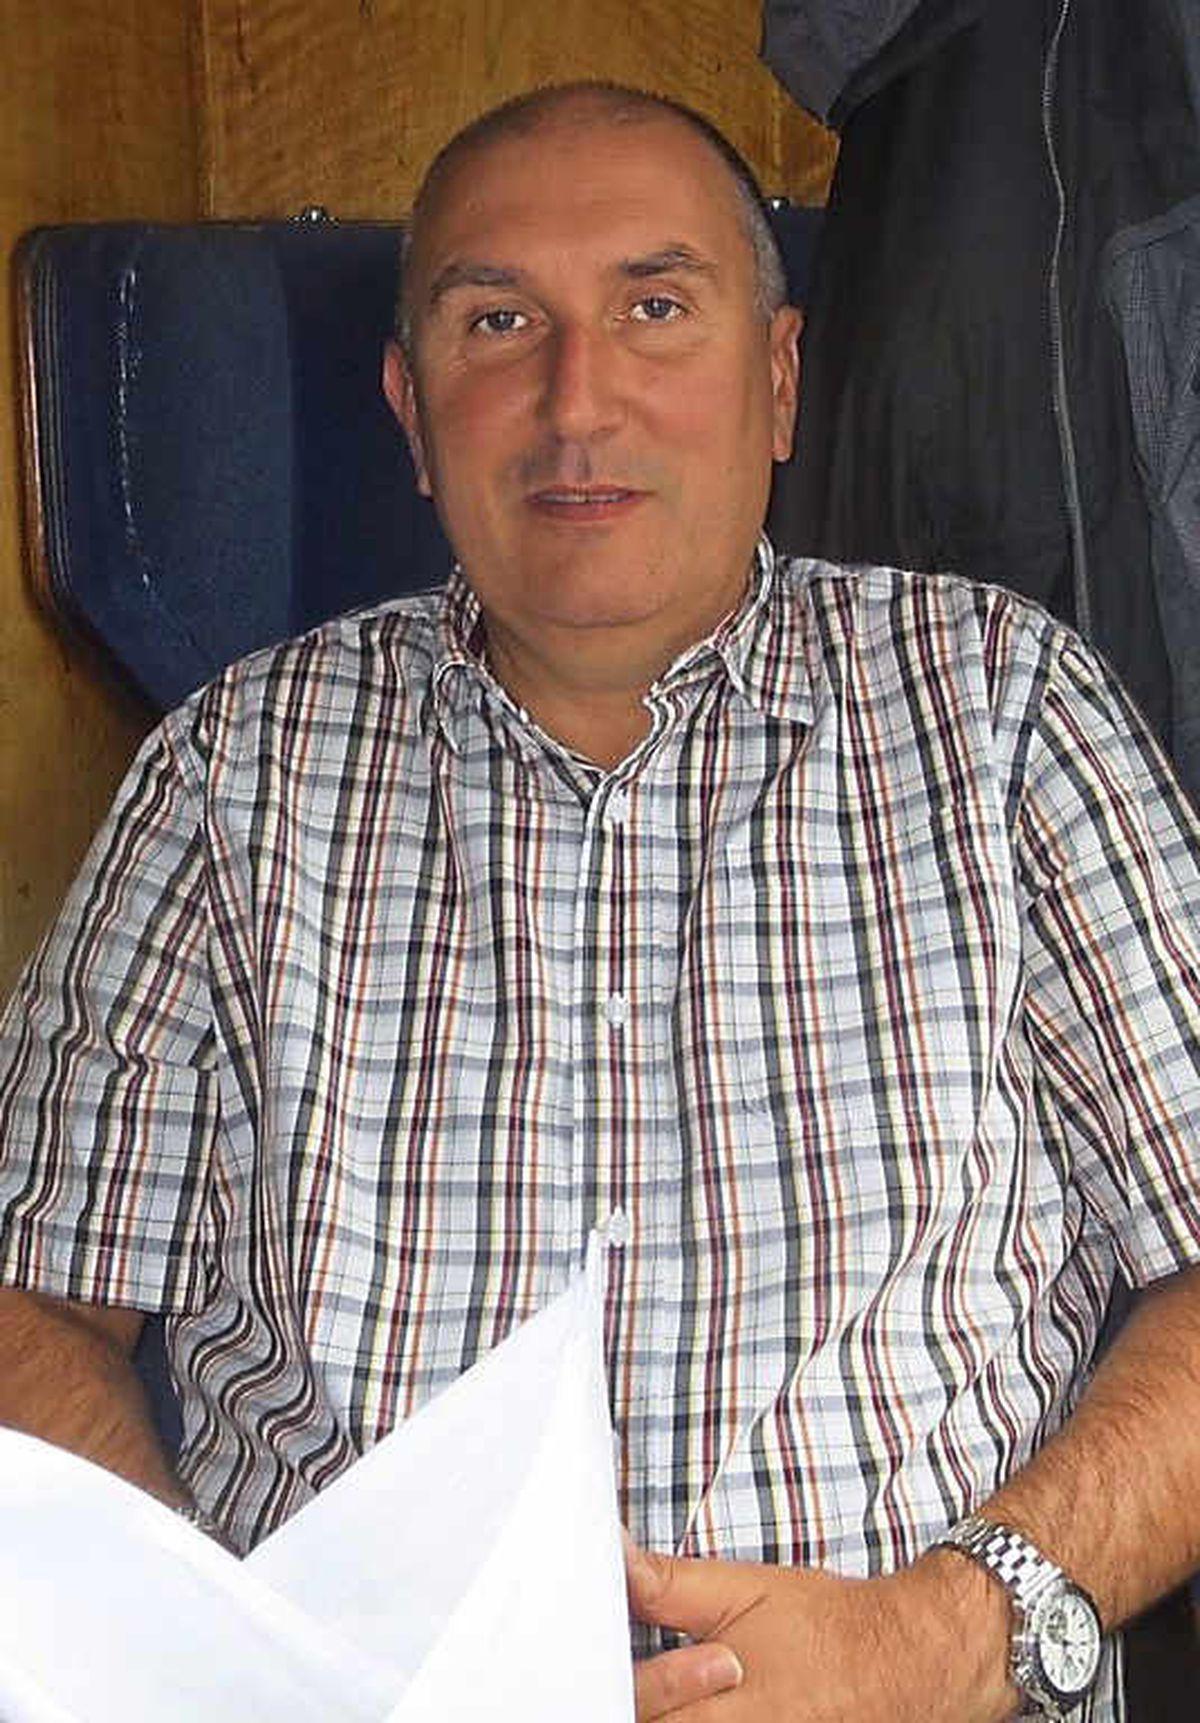 Sales manager Steve Jones